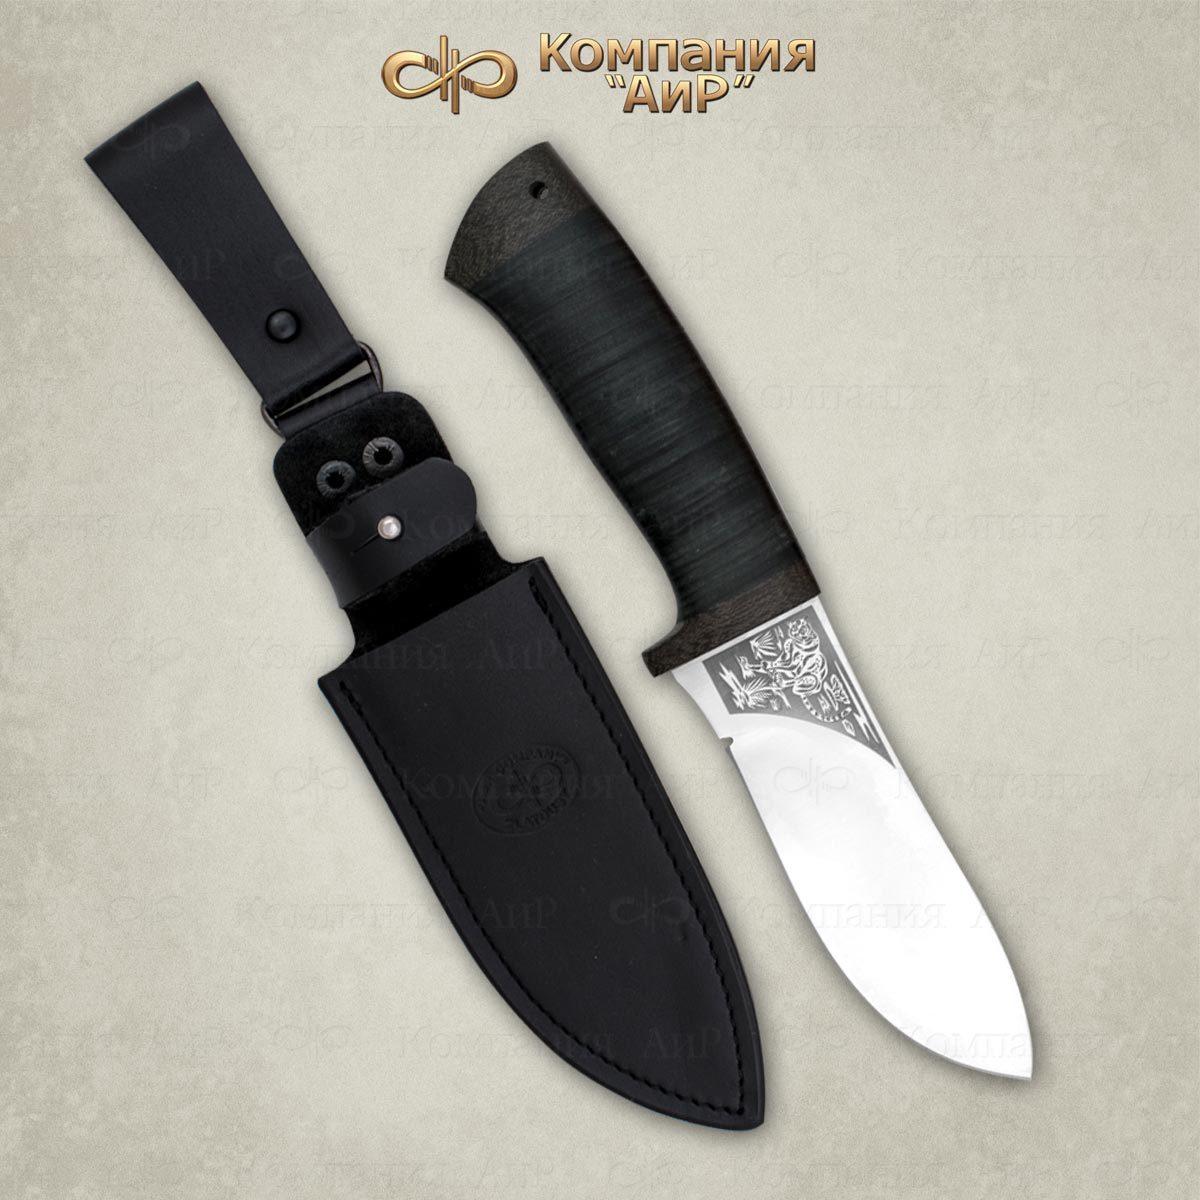 Нож разделочный Аир Гепард, сталь 95х18, рукоять кожа